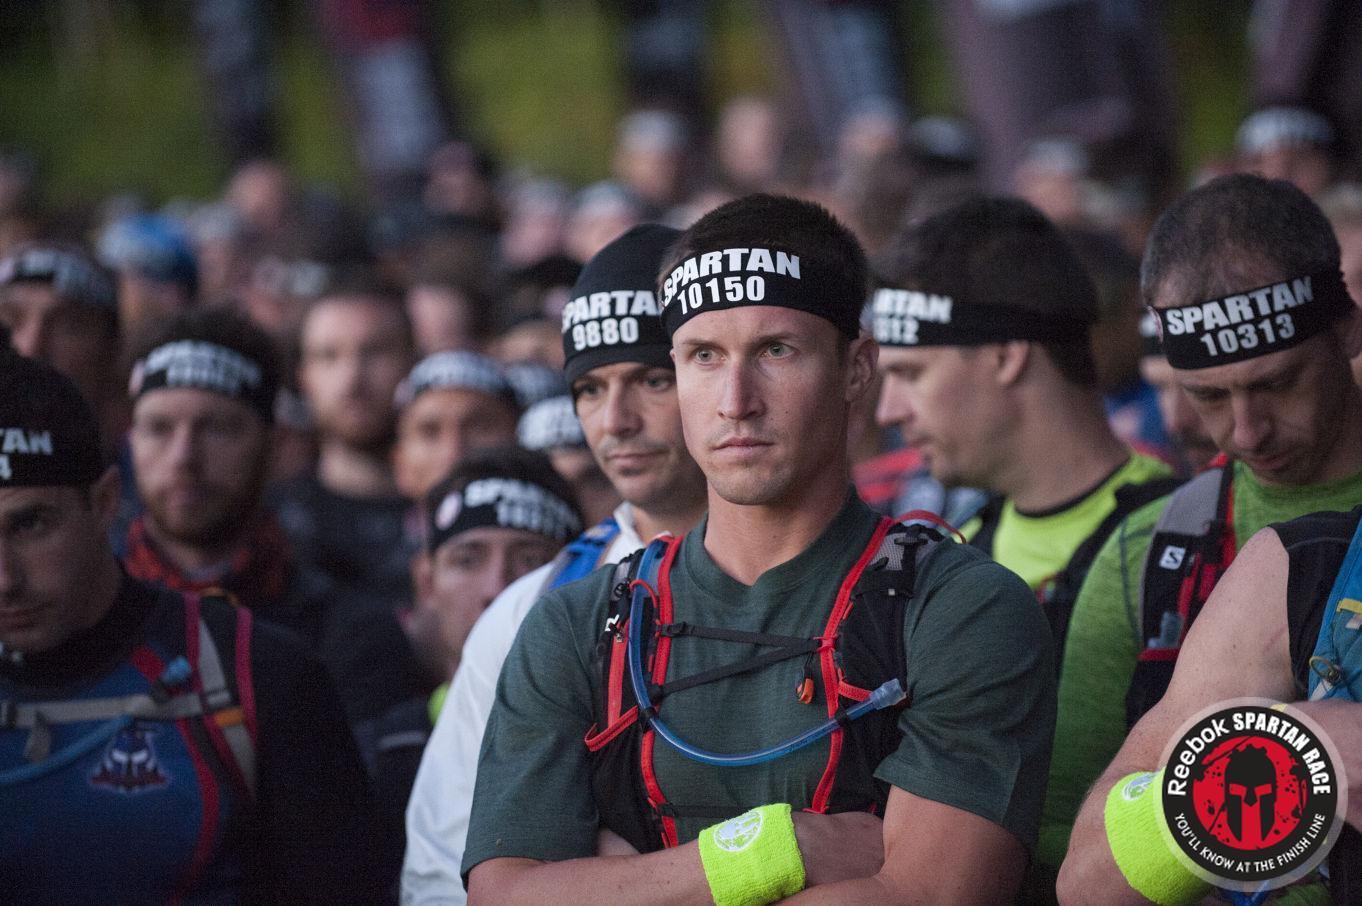 Spartan Race - Killington, VT - Determination